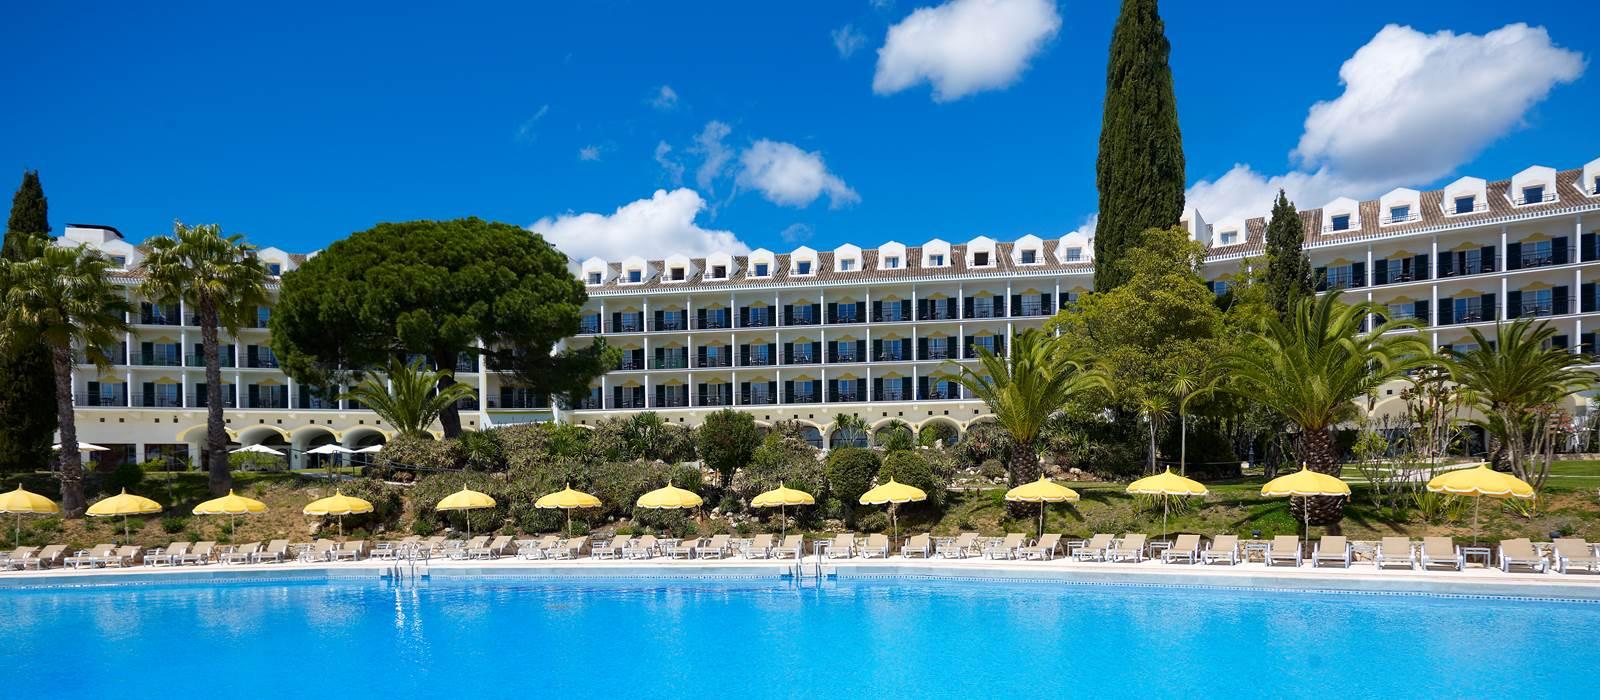 Penina hotel golf resort luxury golf resort algarve for Hotel luxury algarve